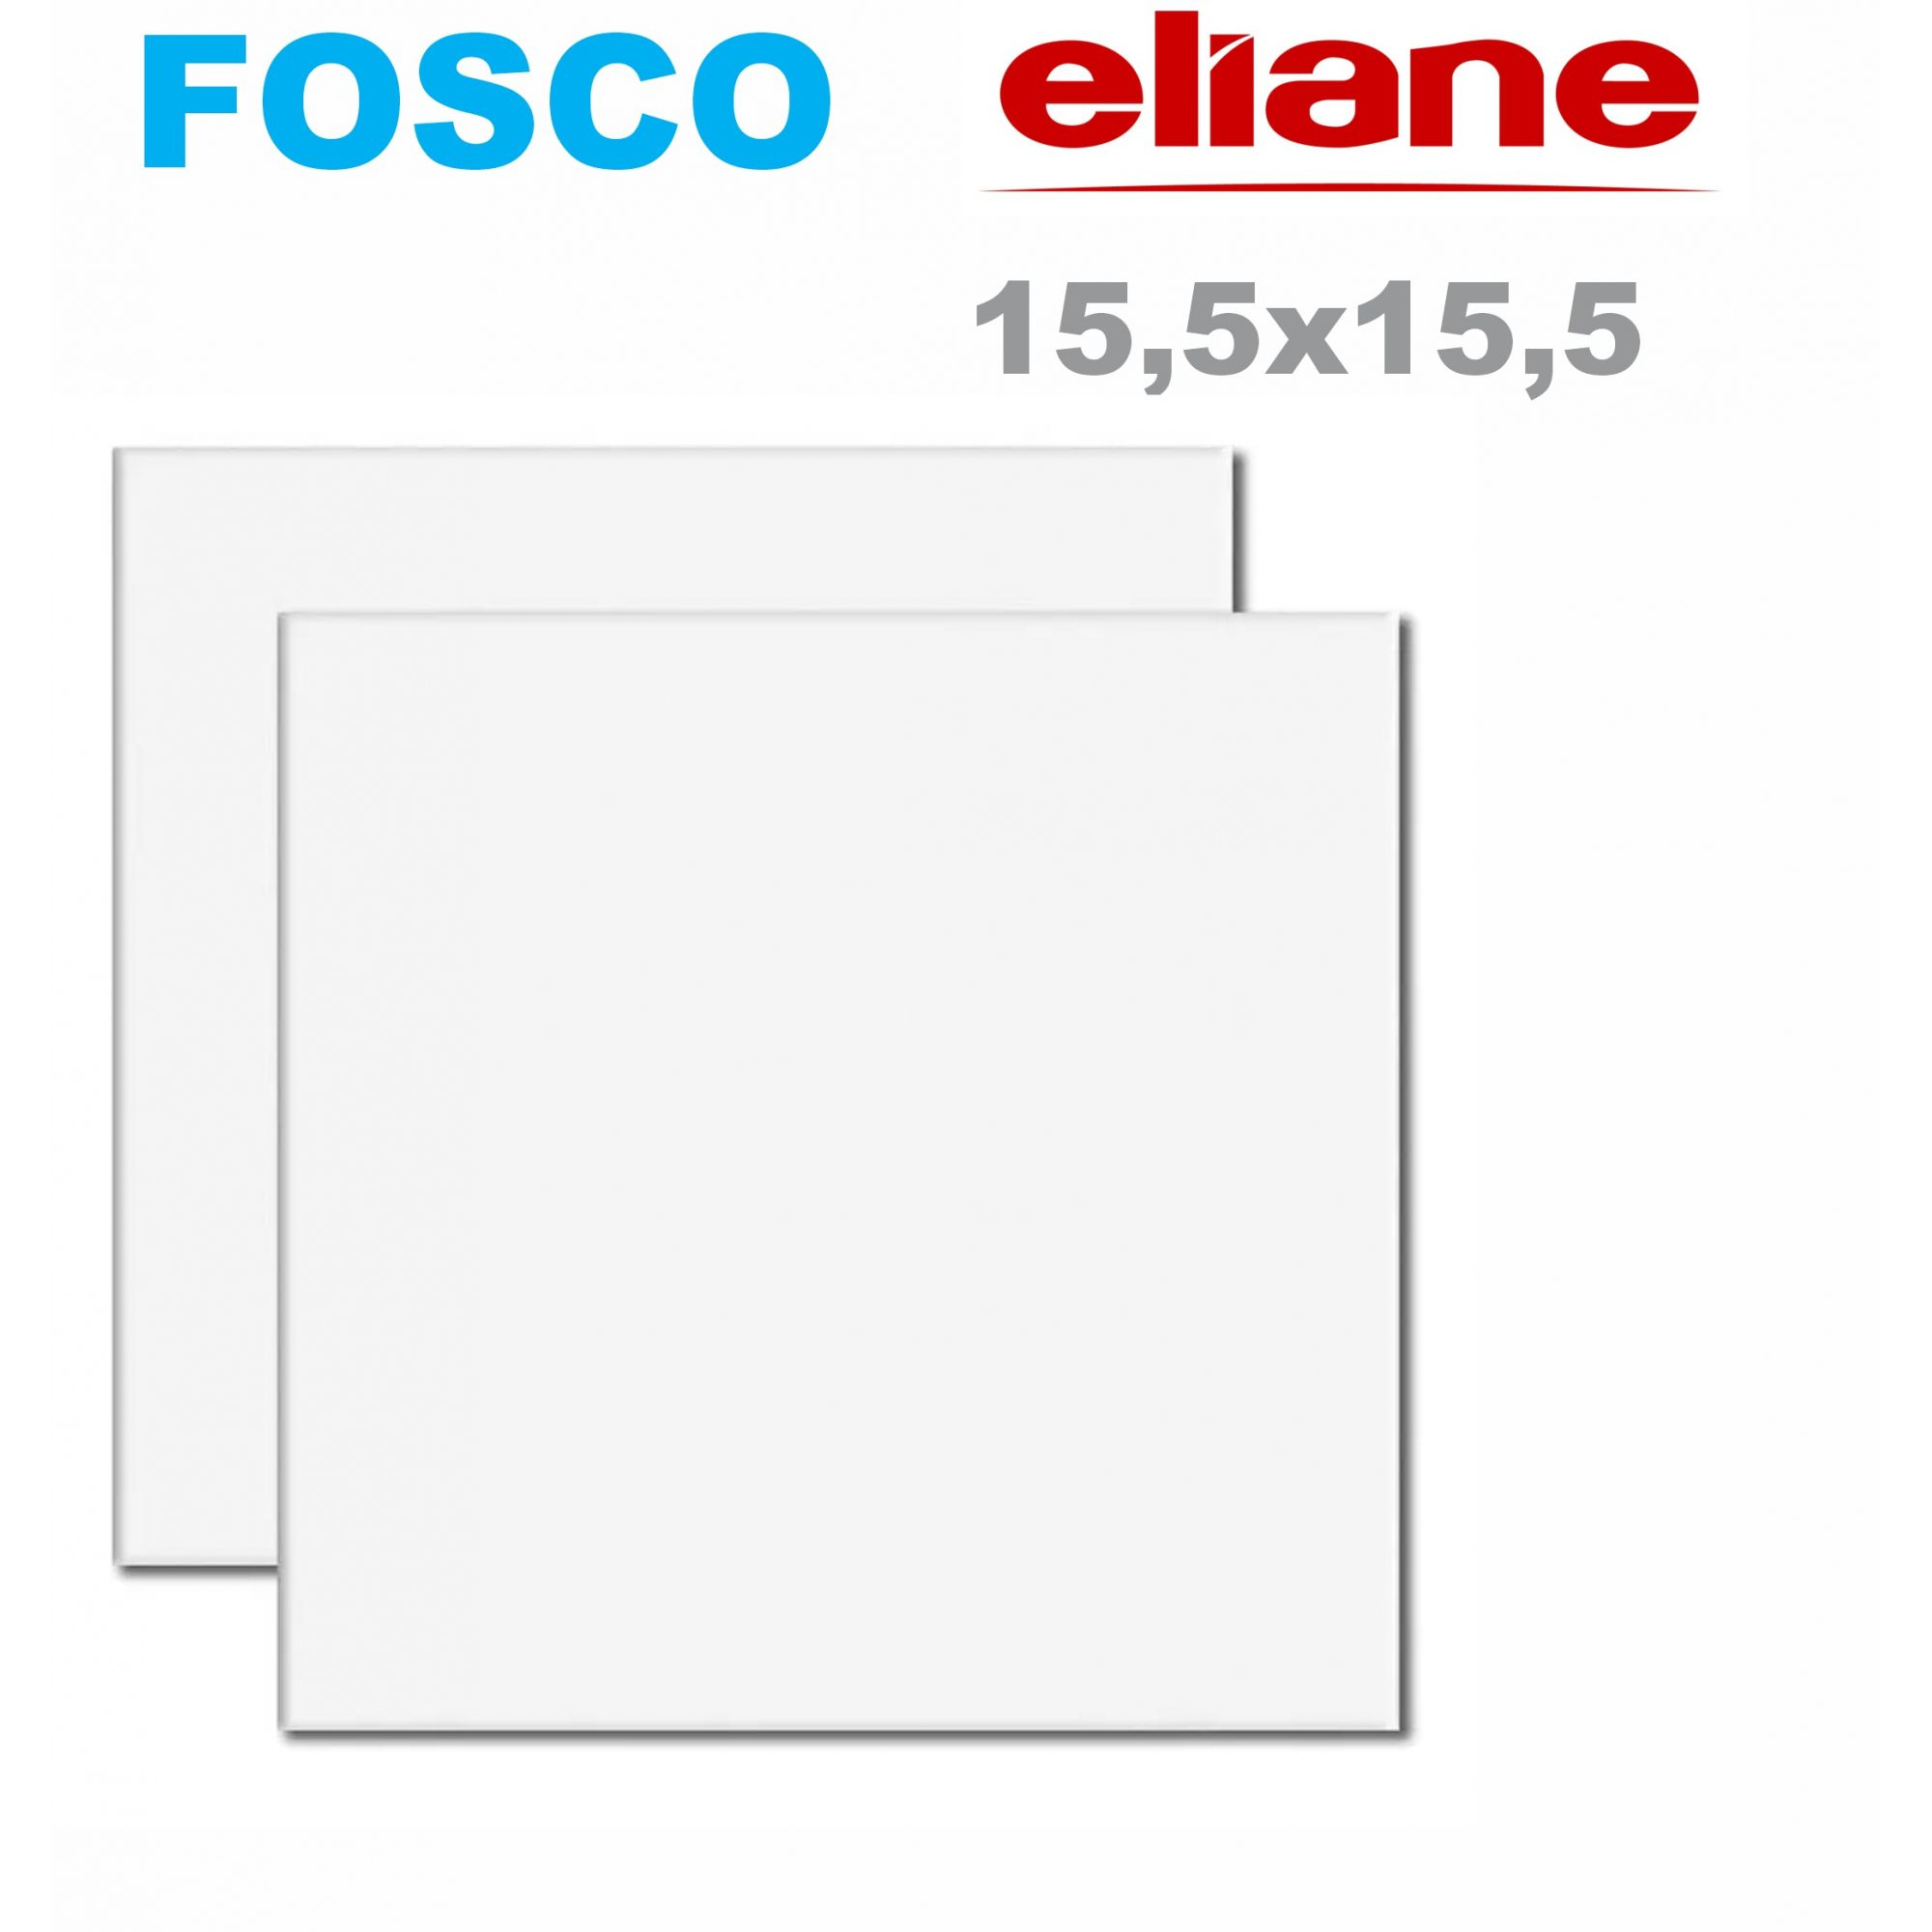 Azulejo Fosco 15X15 10 unidades